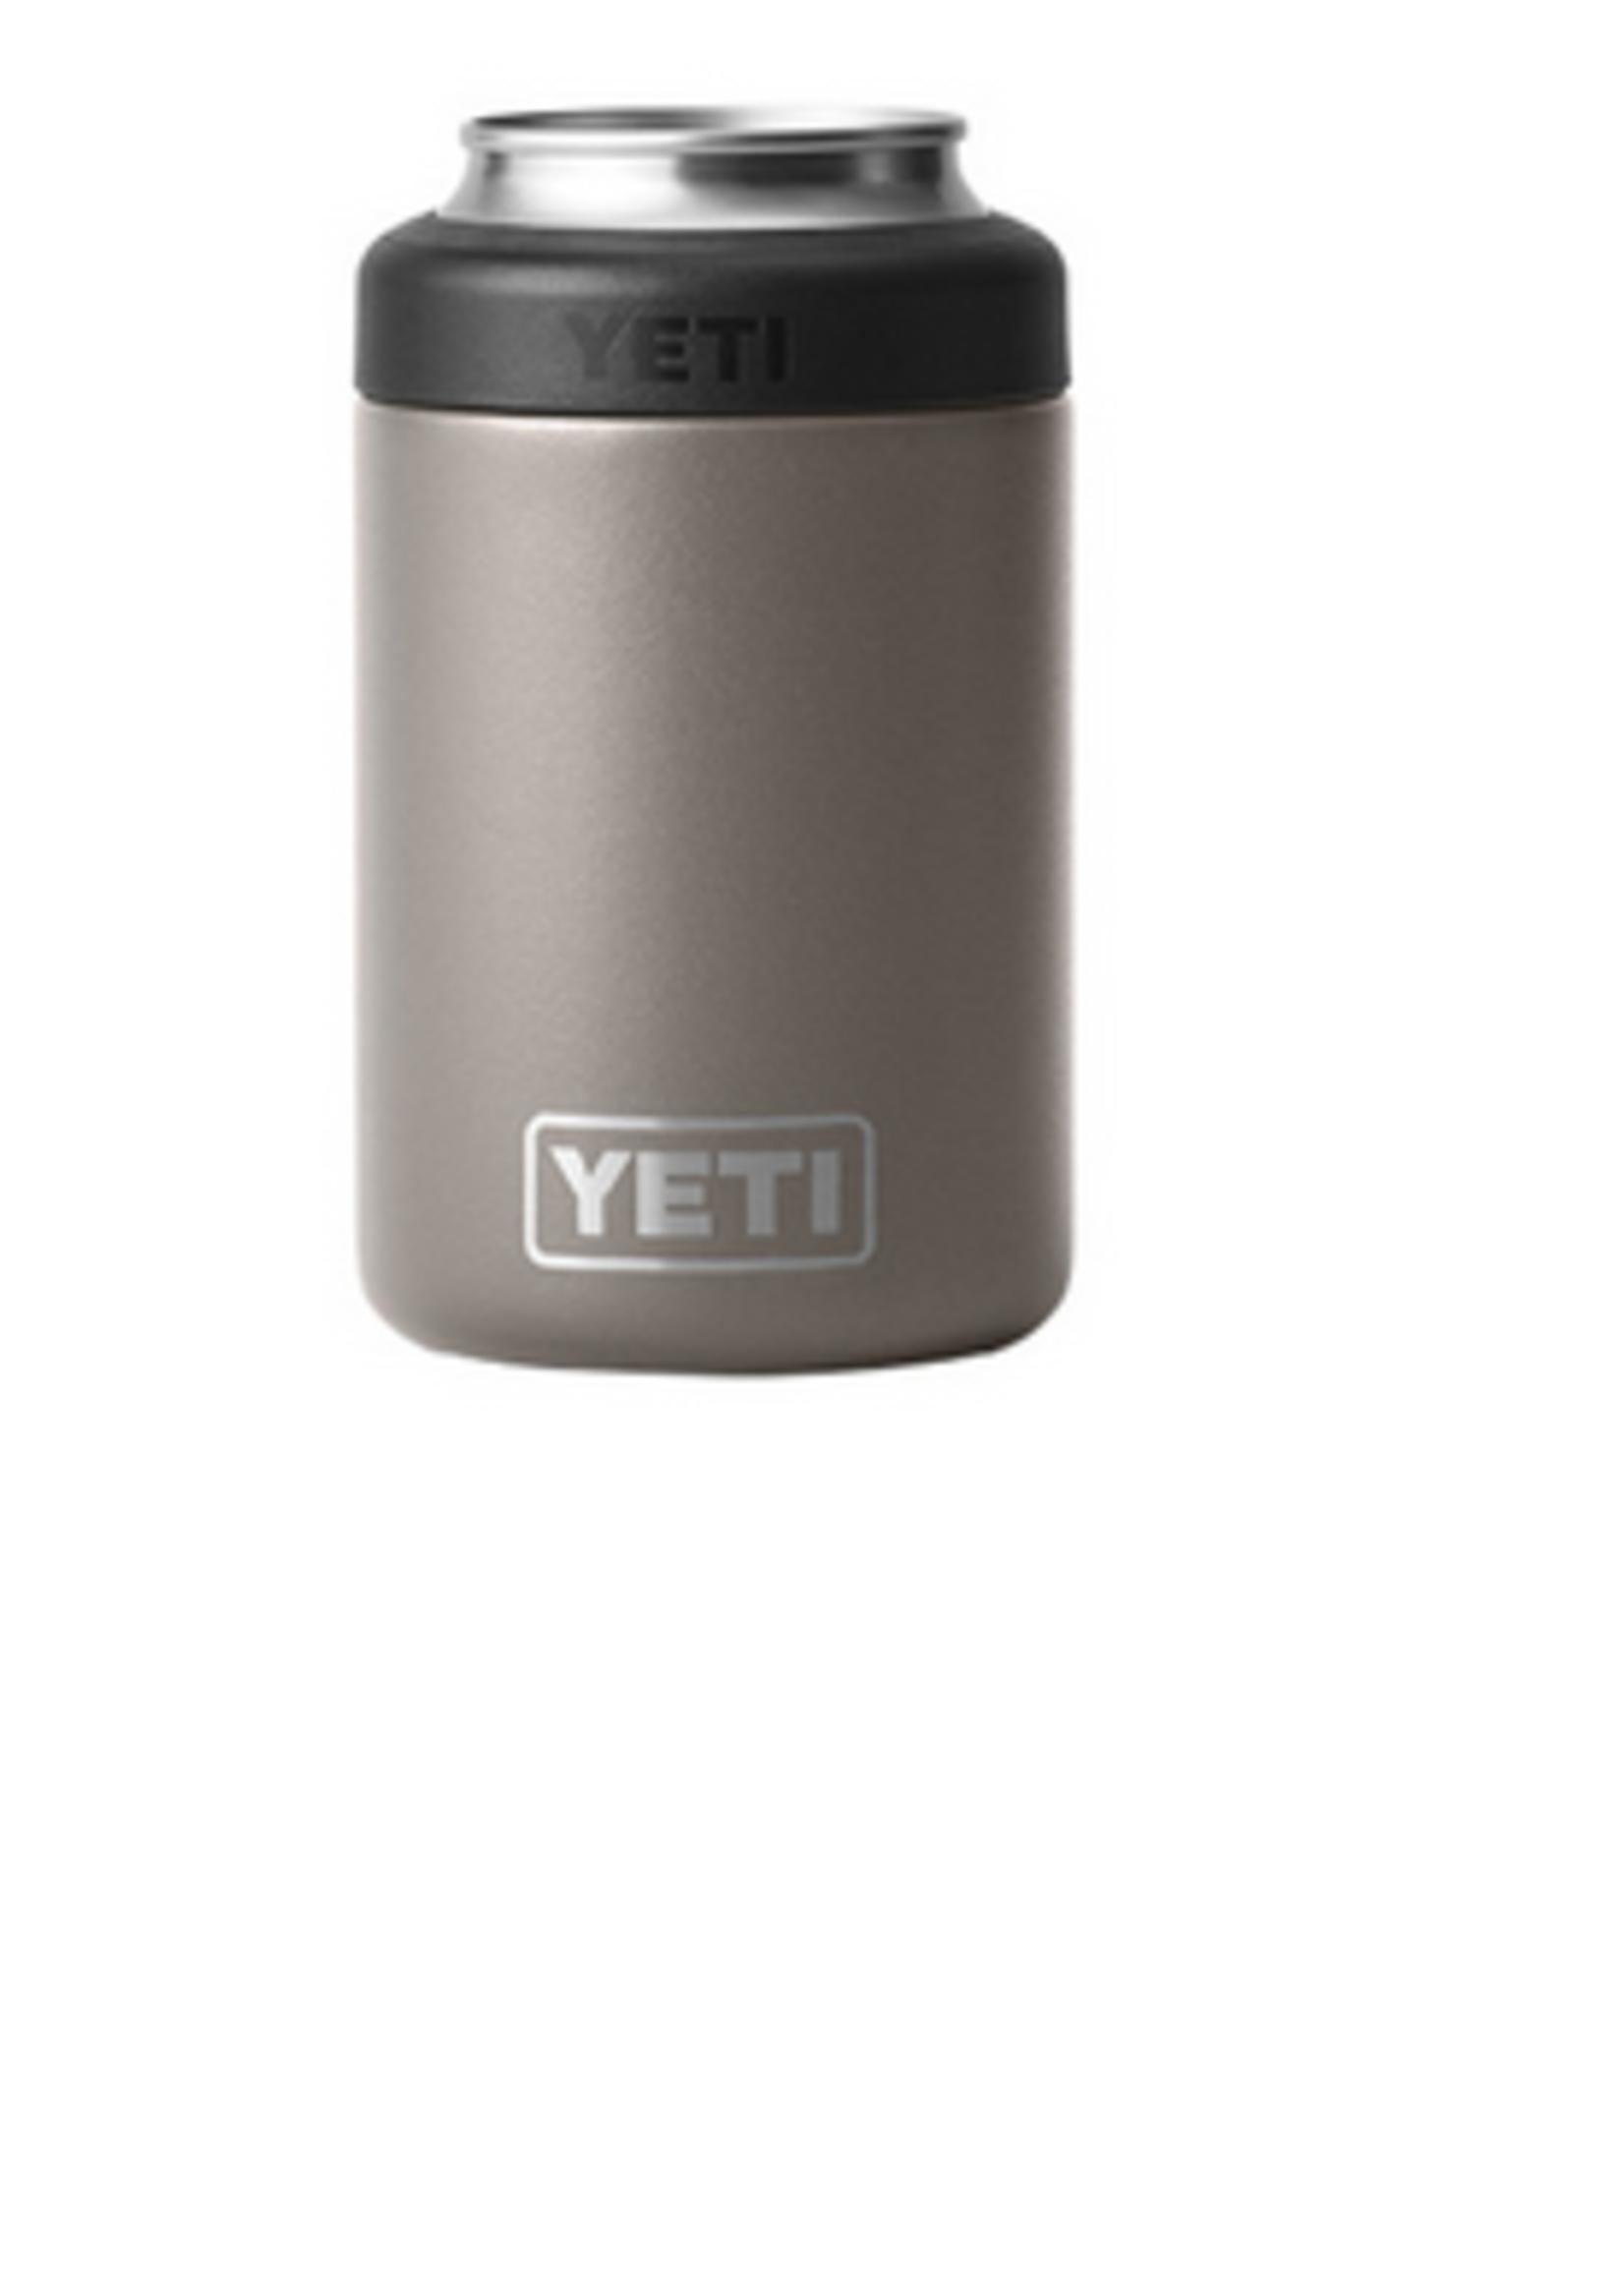 YETI Rambler Colster 2.0 Sharptail Taupe